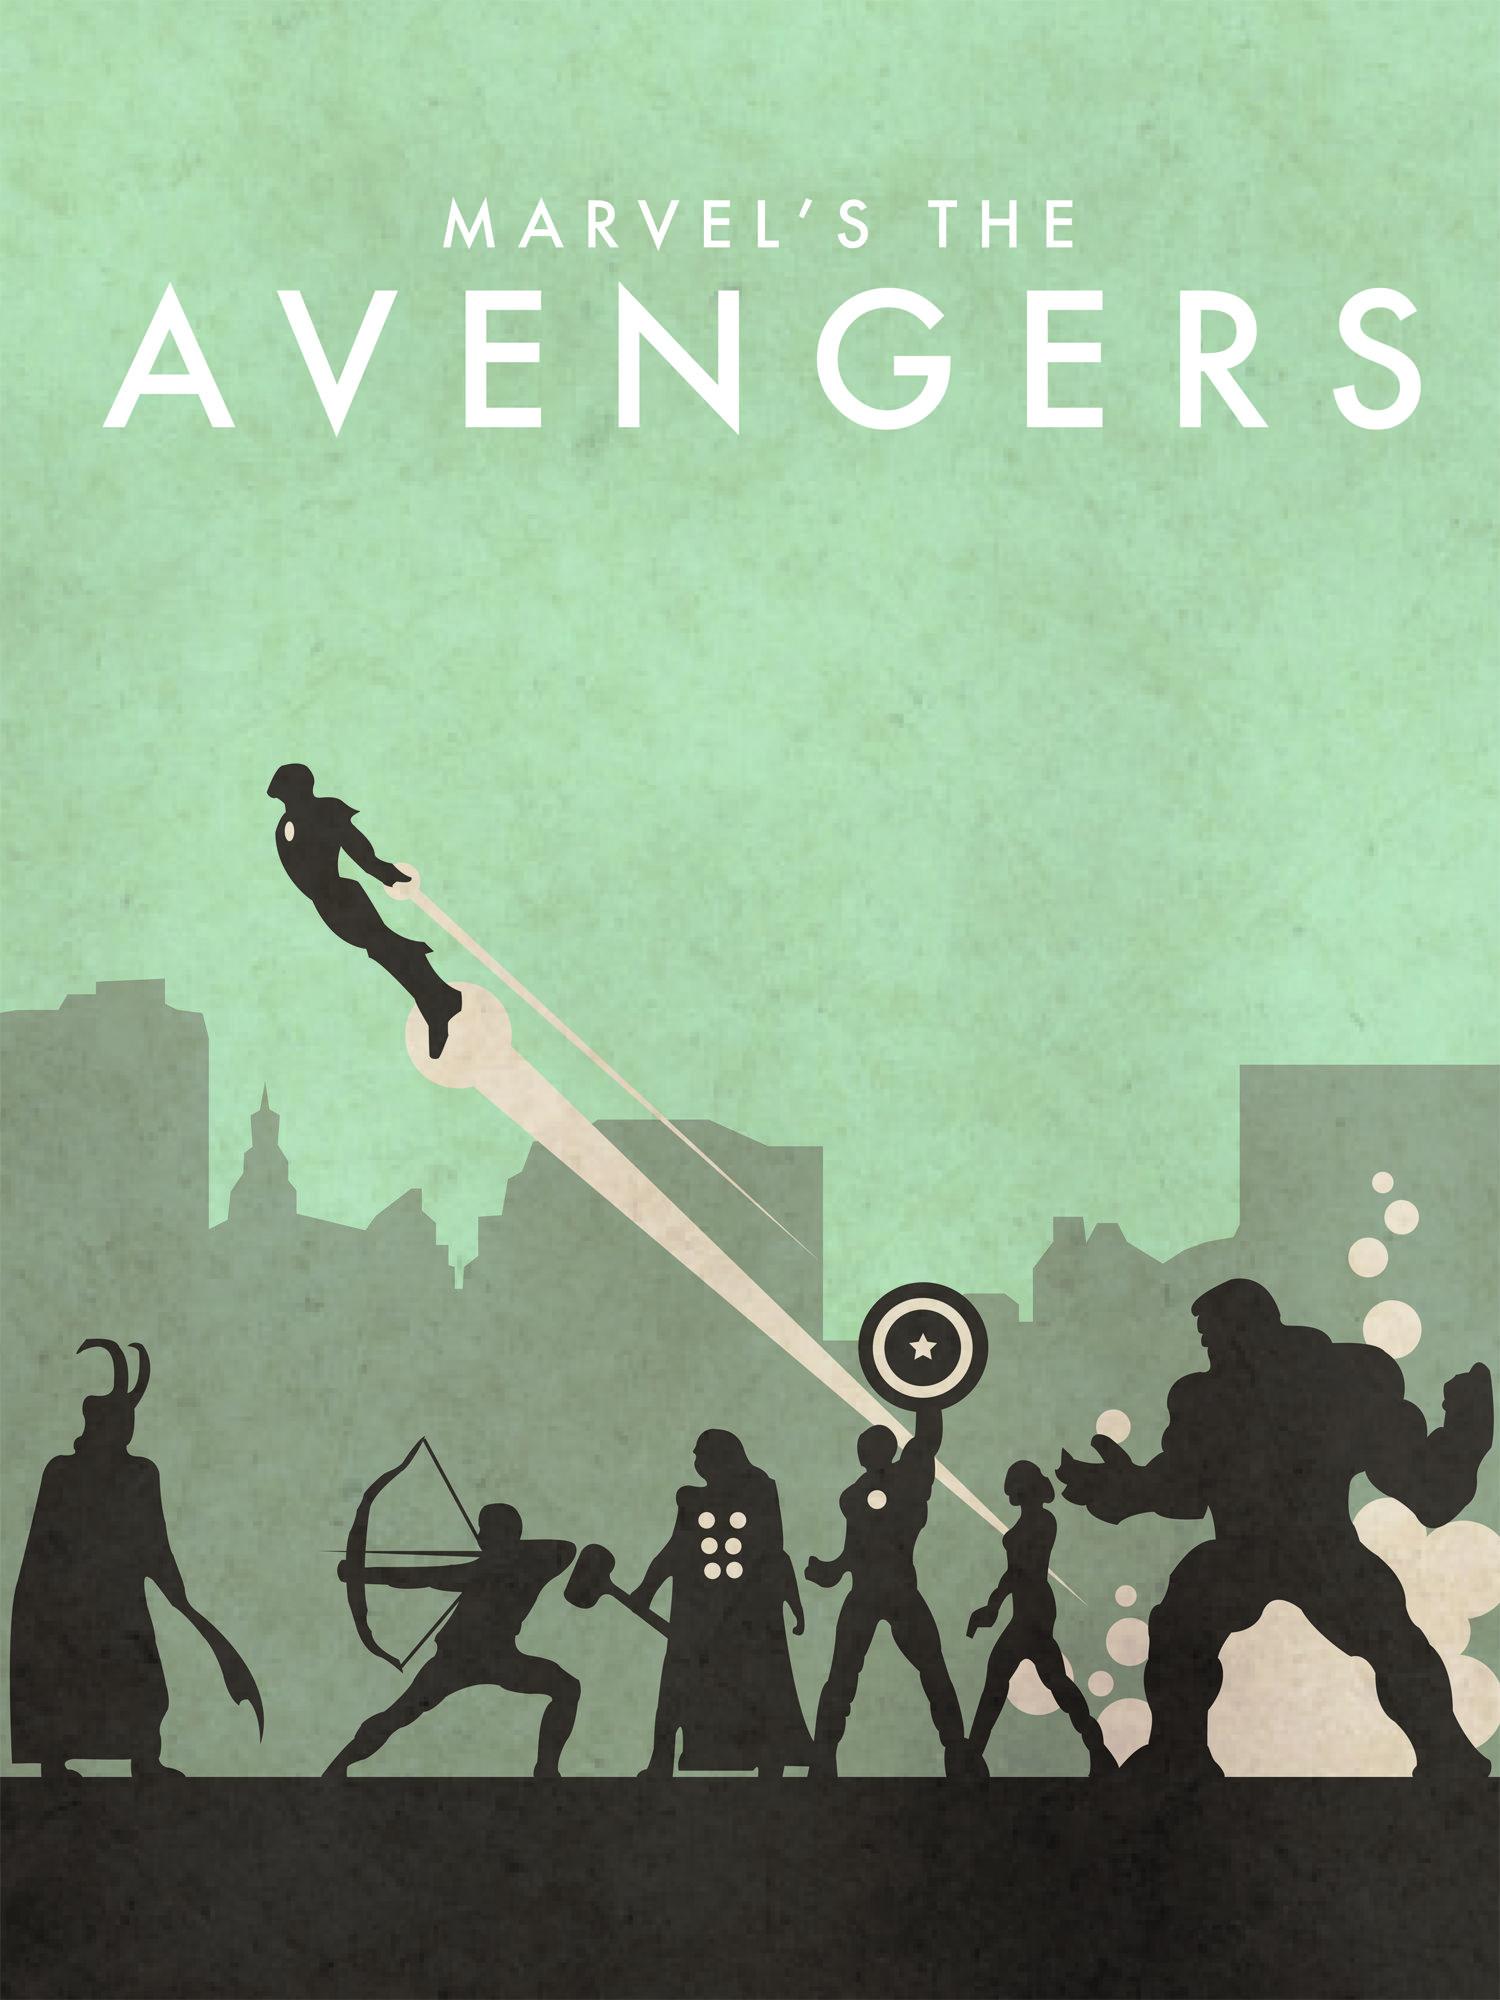 AVENGERS Portrait Marvel Minimalist Print Illustration Poster Wall Art